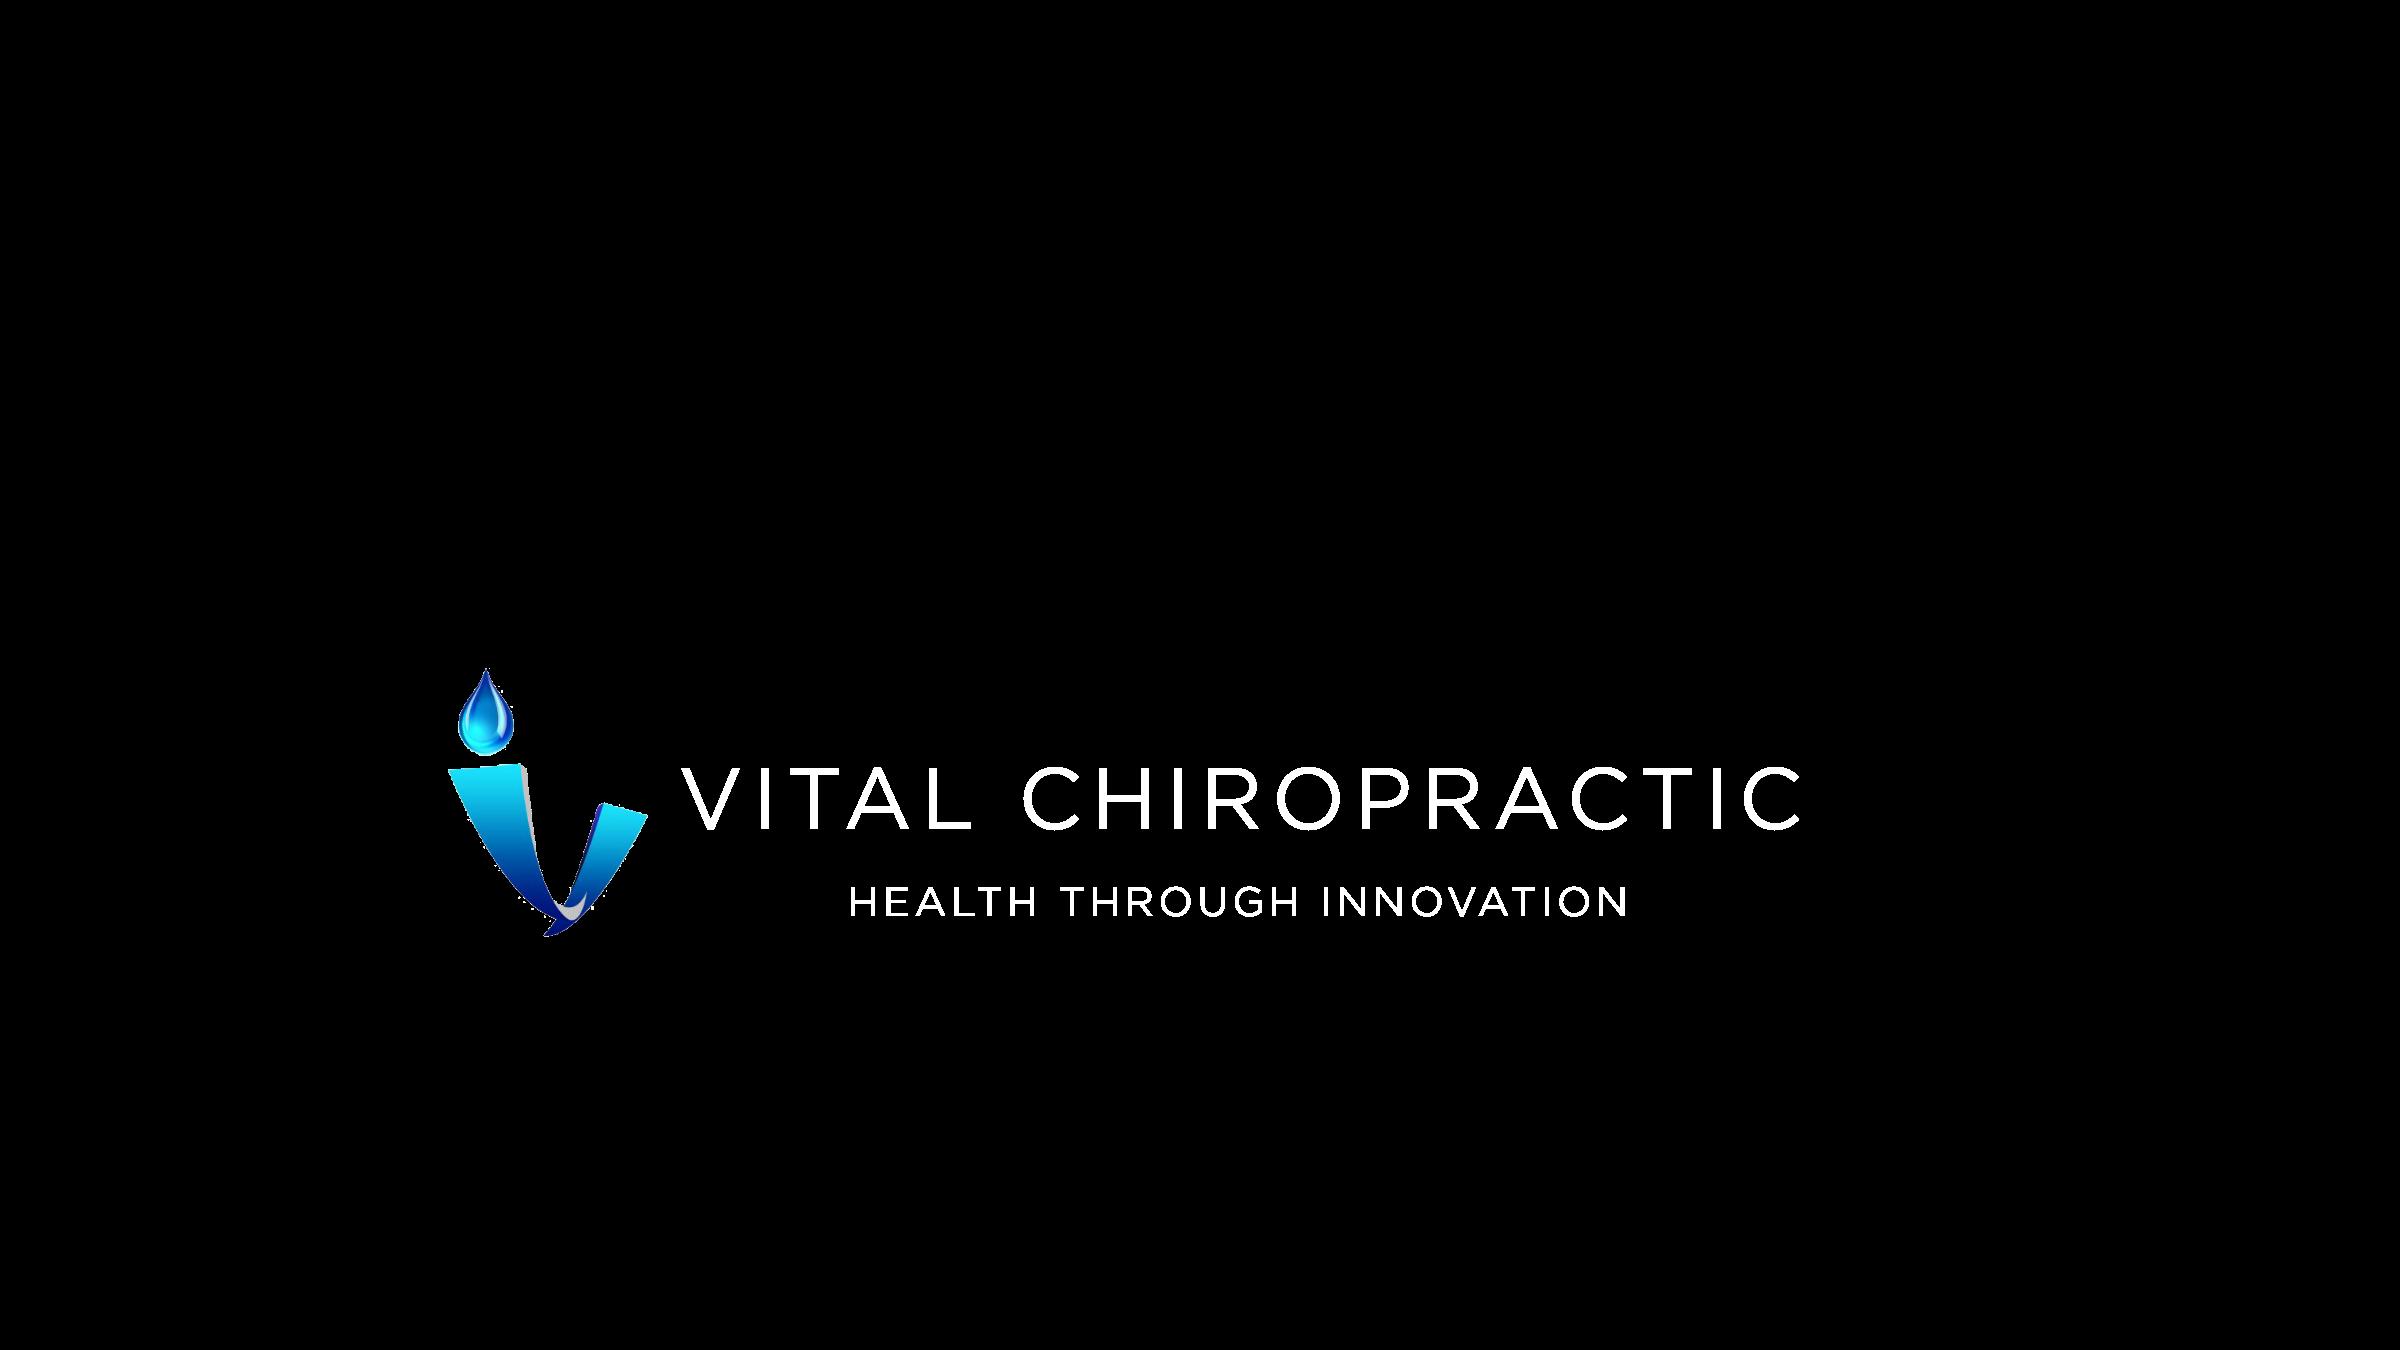 VITAL CHIROPRACTIC | Dr. Nicholas Kraetzer | Fountain Valley | 714.964.5911